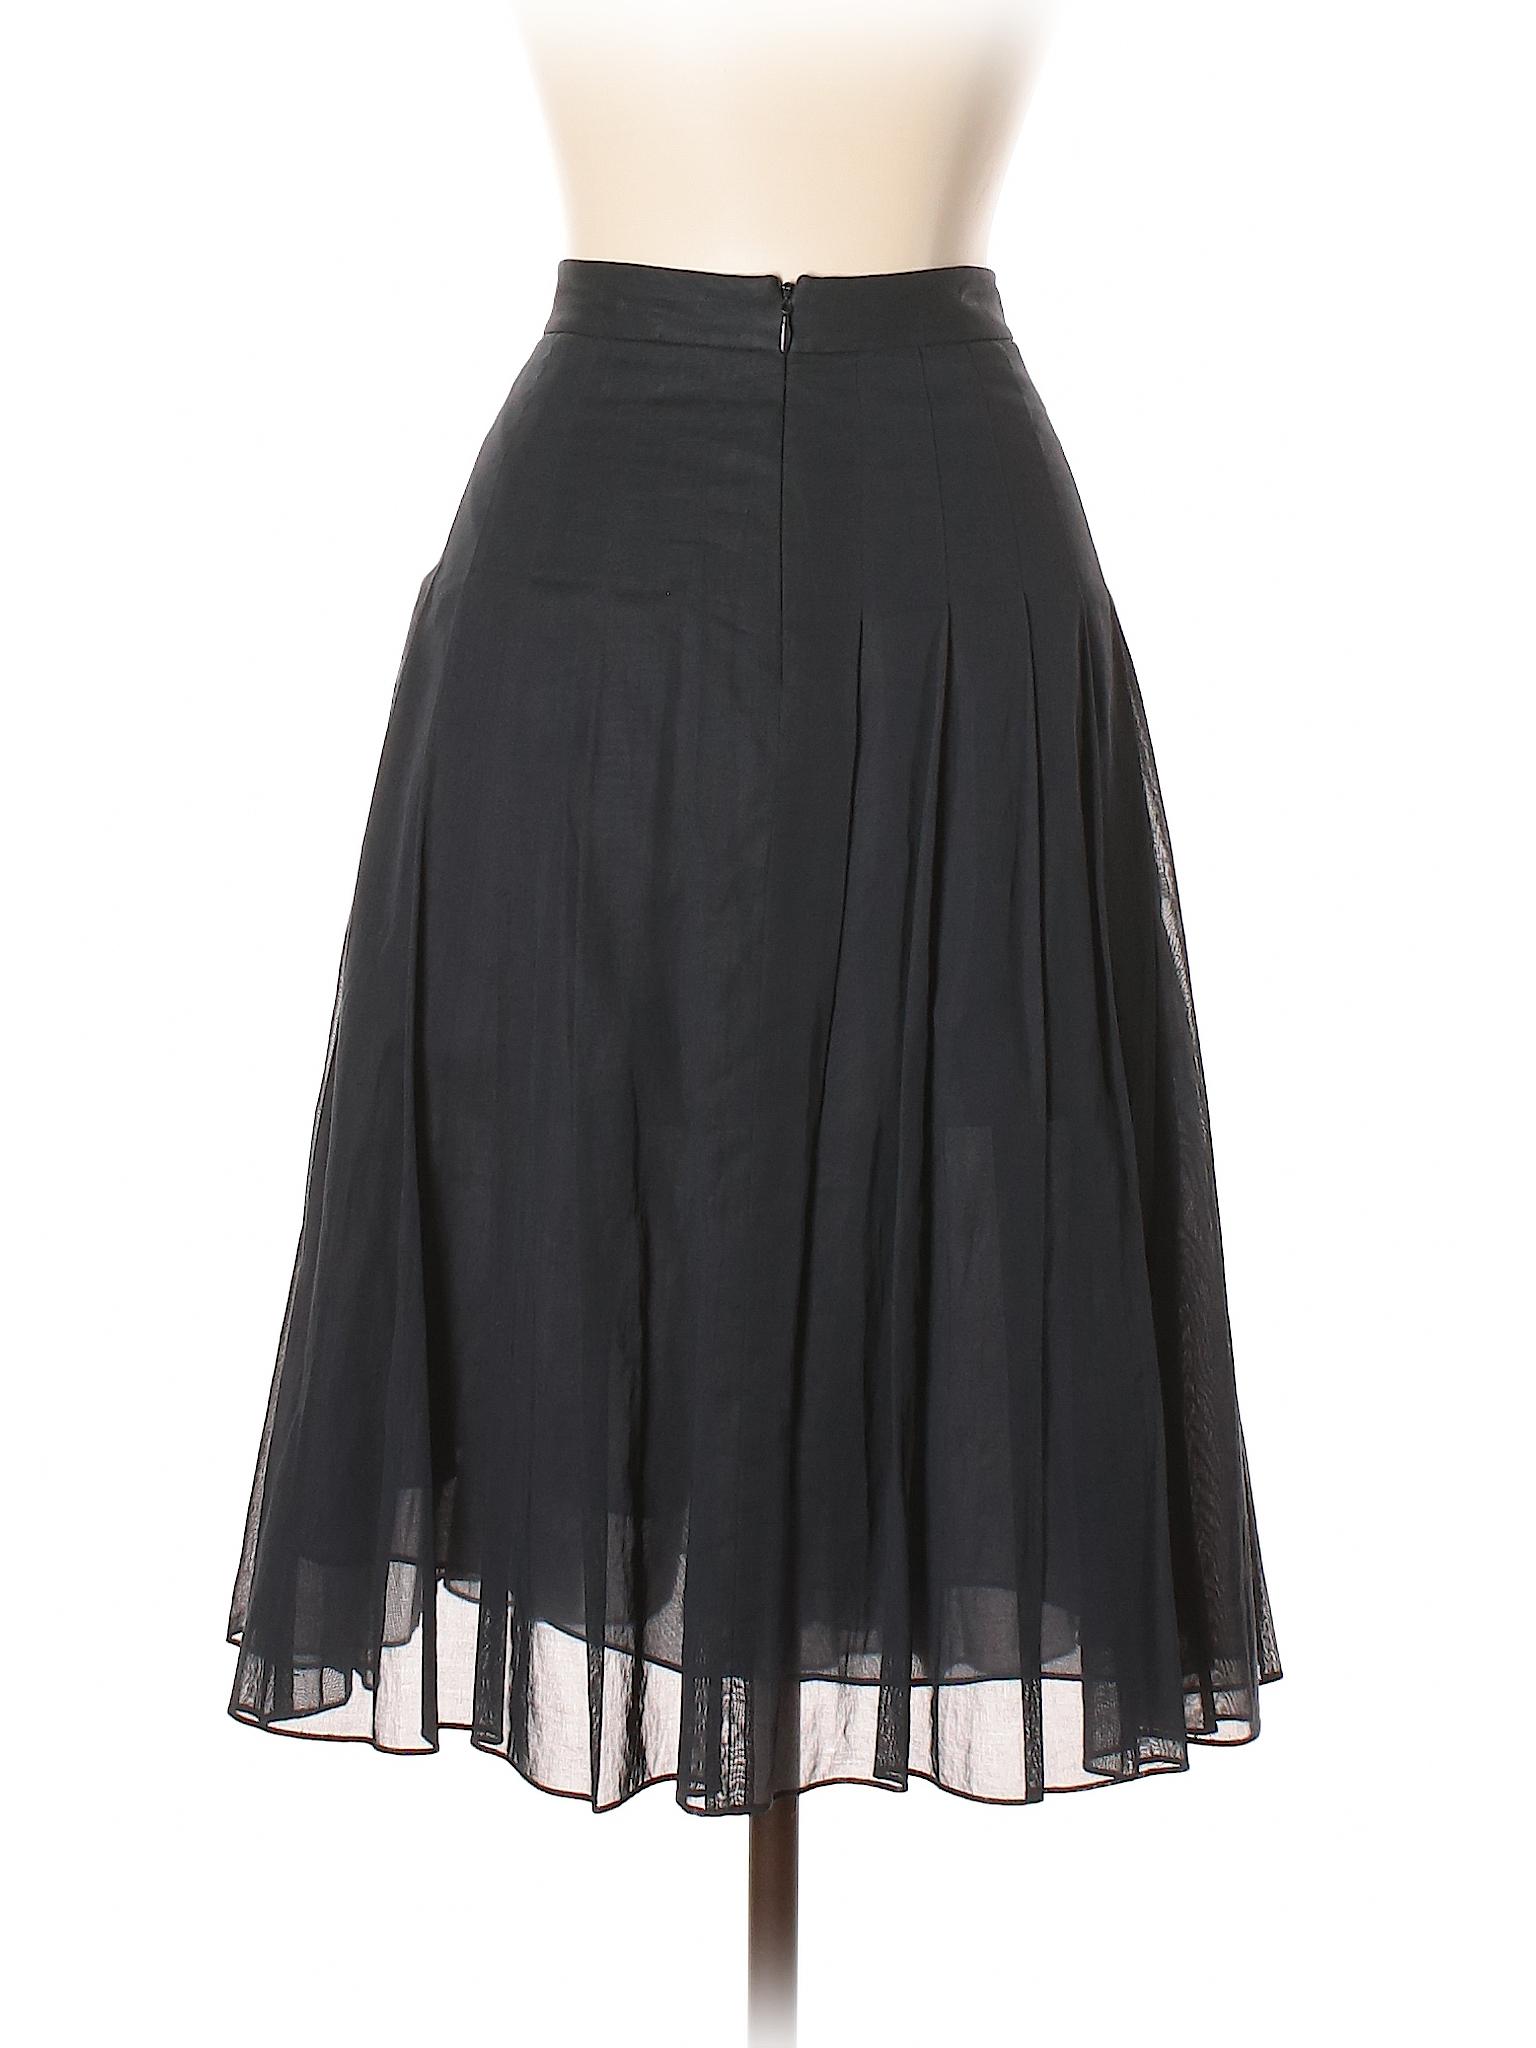 Boutique Skirt Casual Casual Boutique Skirt Boutique Casual Skirt Boutique r0rxd8qvZw